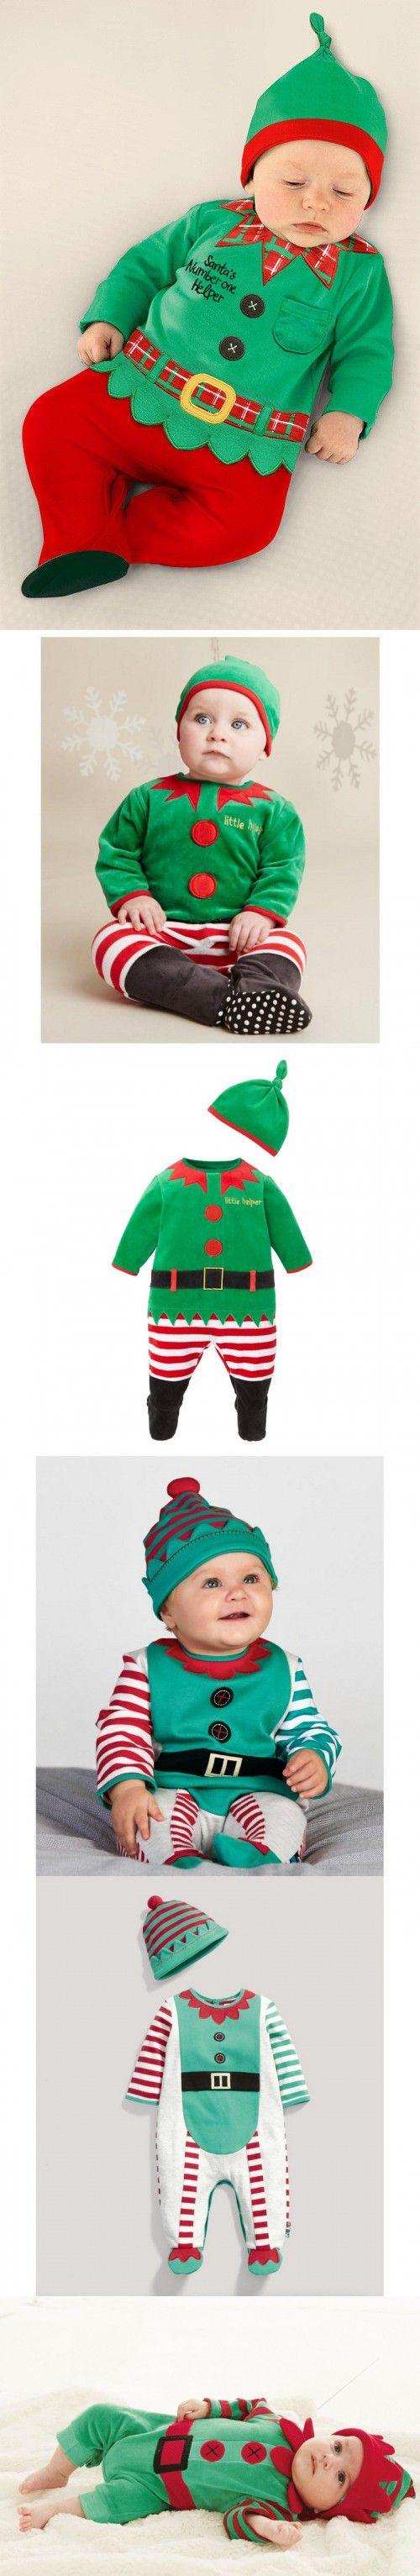 Christmas Baby Rompers Santa Costumes Baby Clothing sets Overall baby boy clothes jumpsuit roupa de bebe roupas para bebe menino